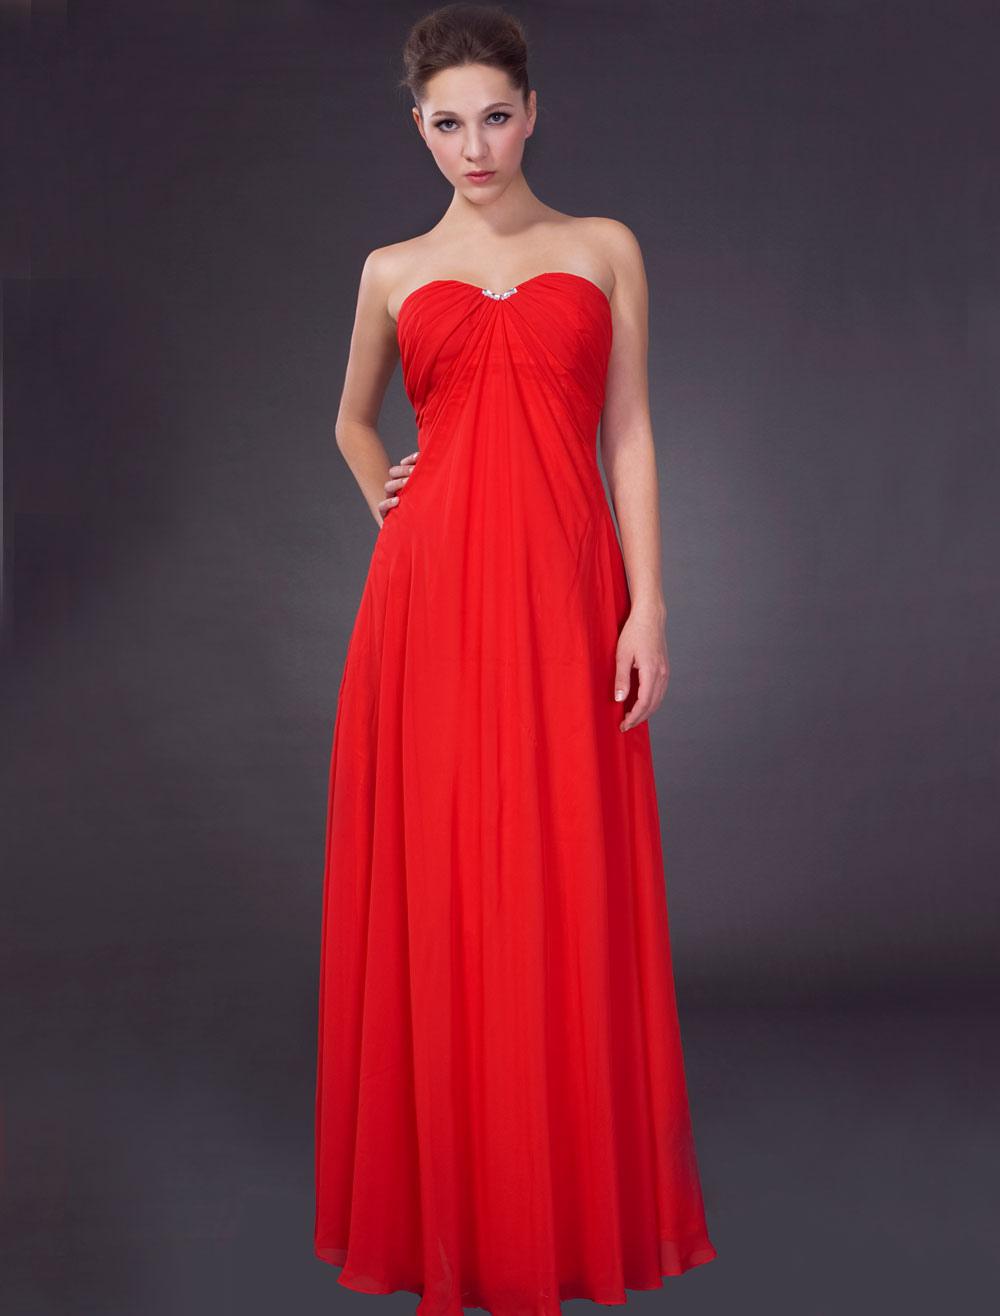 Red Empire Waist Strapless Satin Chiffon Maxi Evening Gown (Wedding Cheap Party Dress) photo